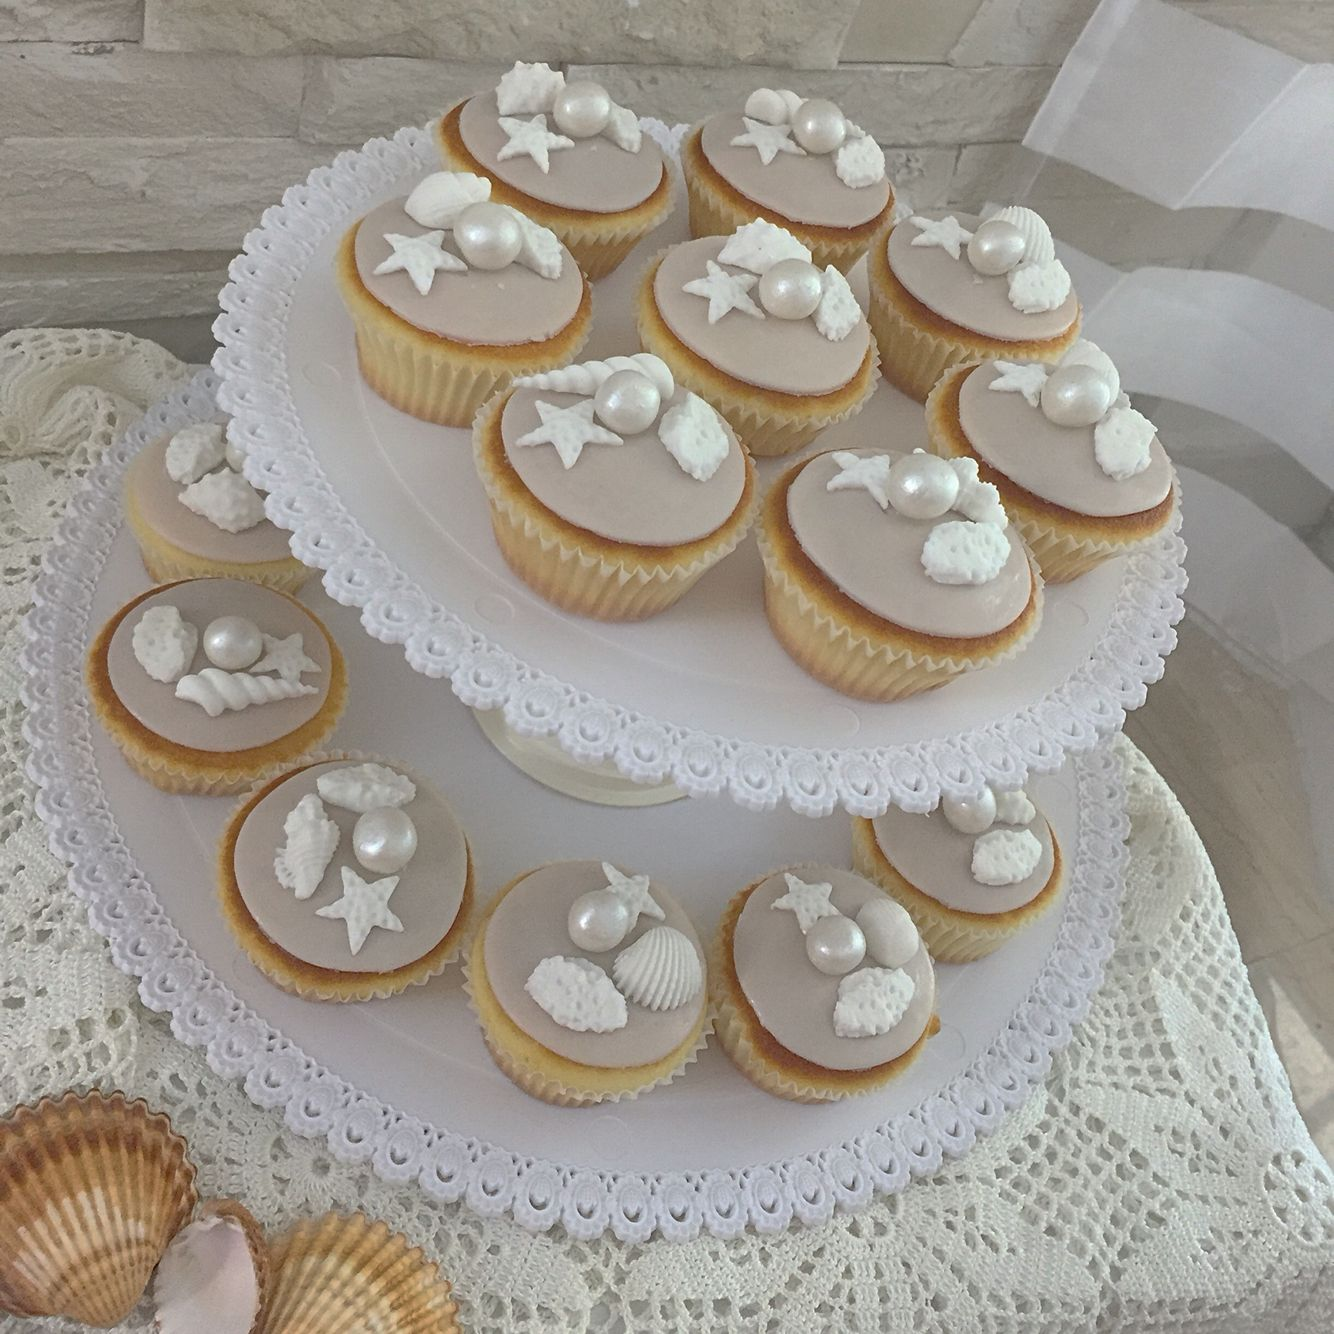 Cupcakes a tema marino 😋🐚 #instafood #ilas #ilassweetness #cakedesign #pastadizucchero #cupcakes #wedding #unicoeventi www.ilas.webnode.it www.facebook.com/ilascake